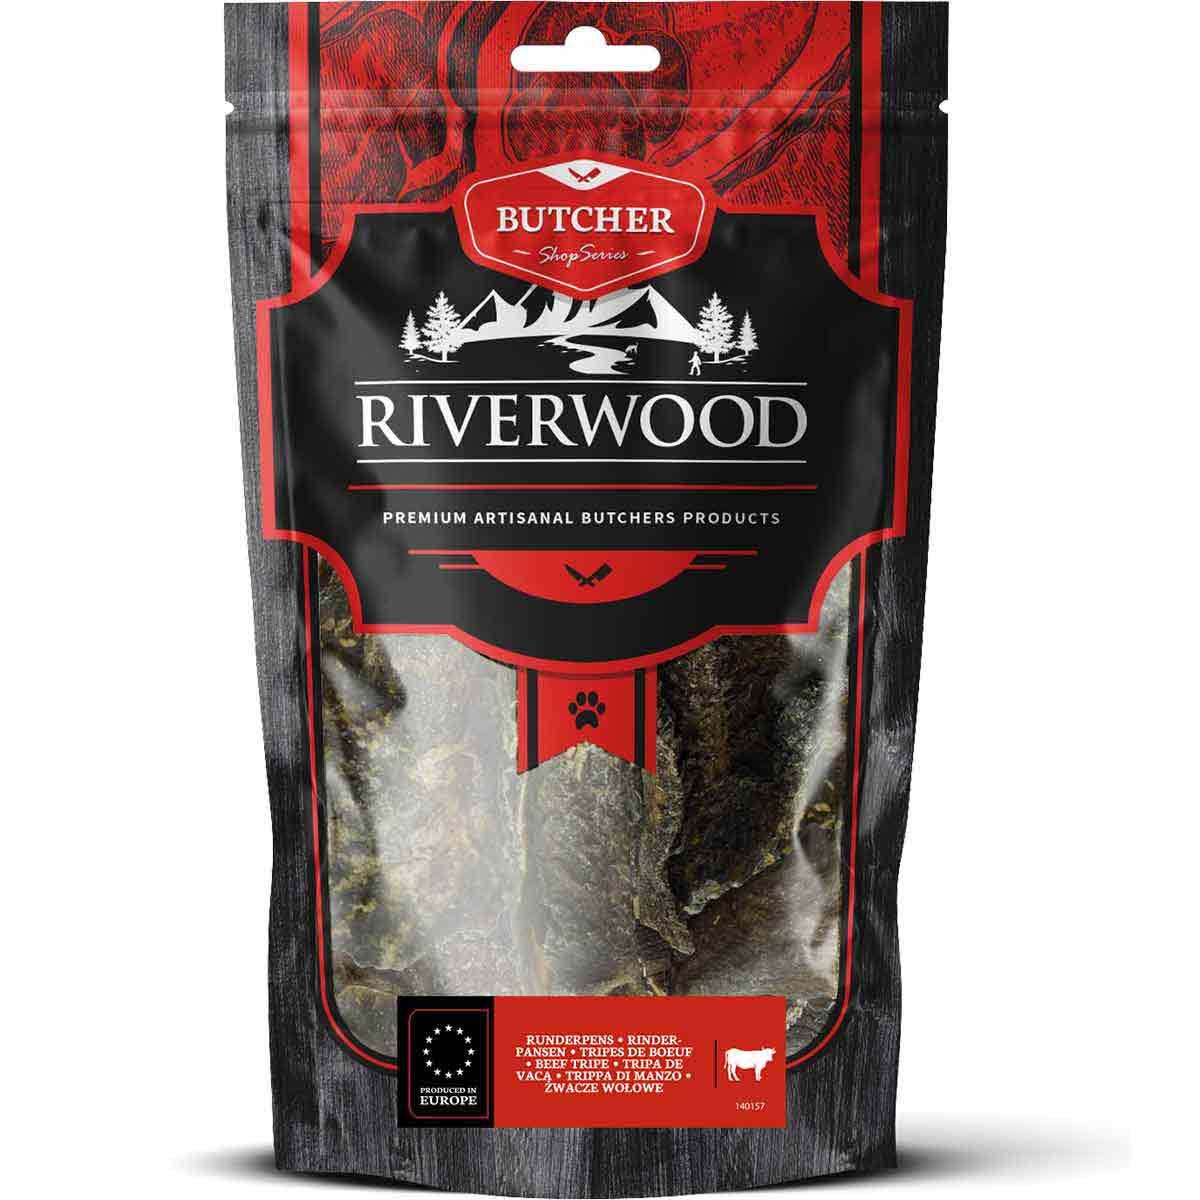 Riverwood Runderpens